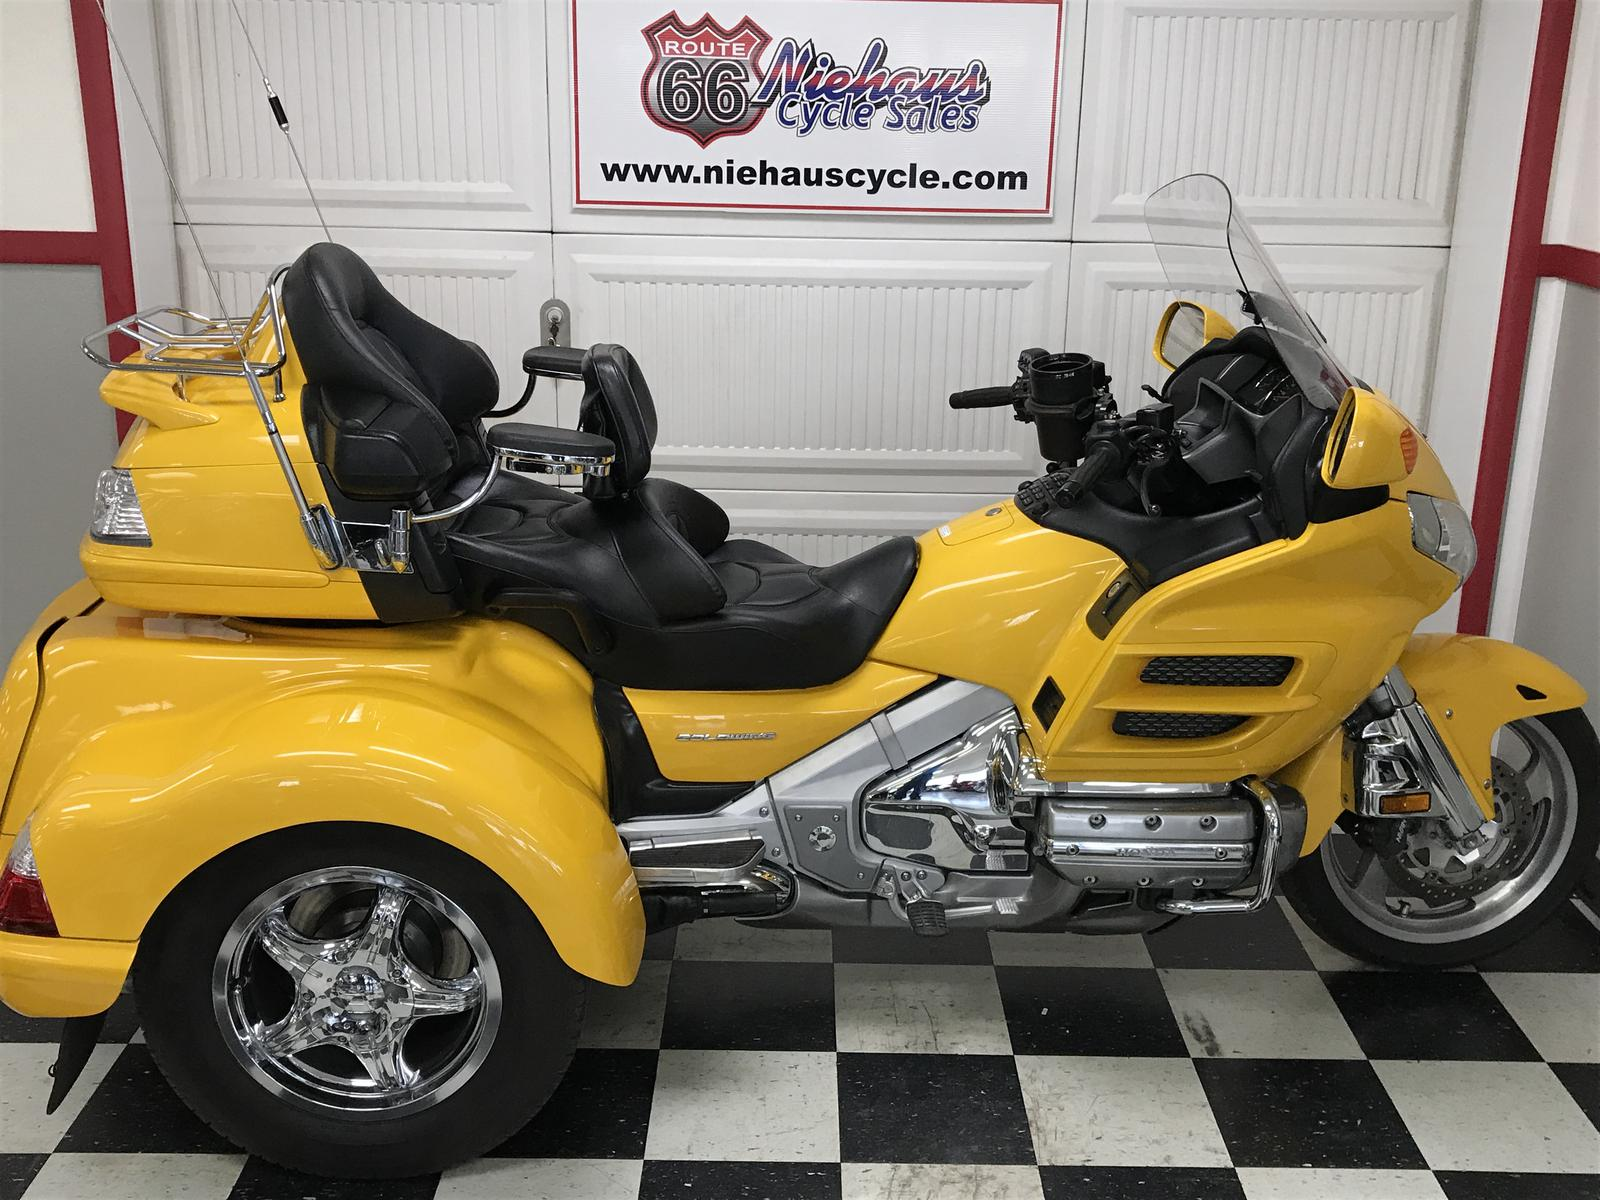 2010 Honda GL1800HP GOLD WING COMFORT/LEHMAN MONARCH II TRIKE For Sale In  Litchfield, IL | Niehaus Cycle Sales (217) 324 6565